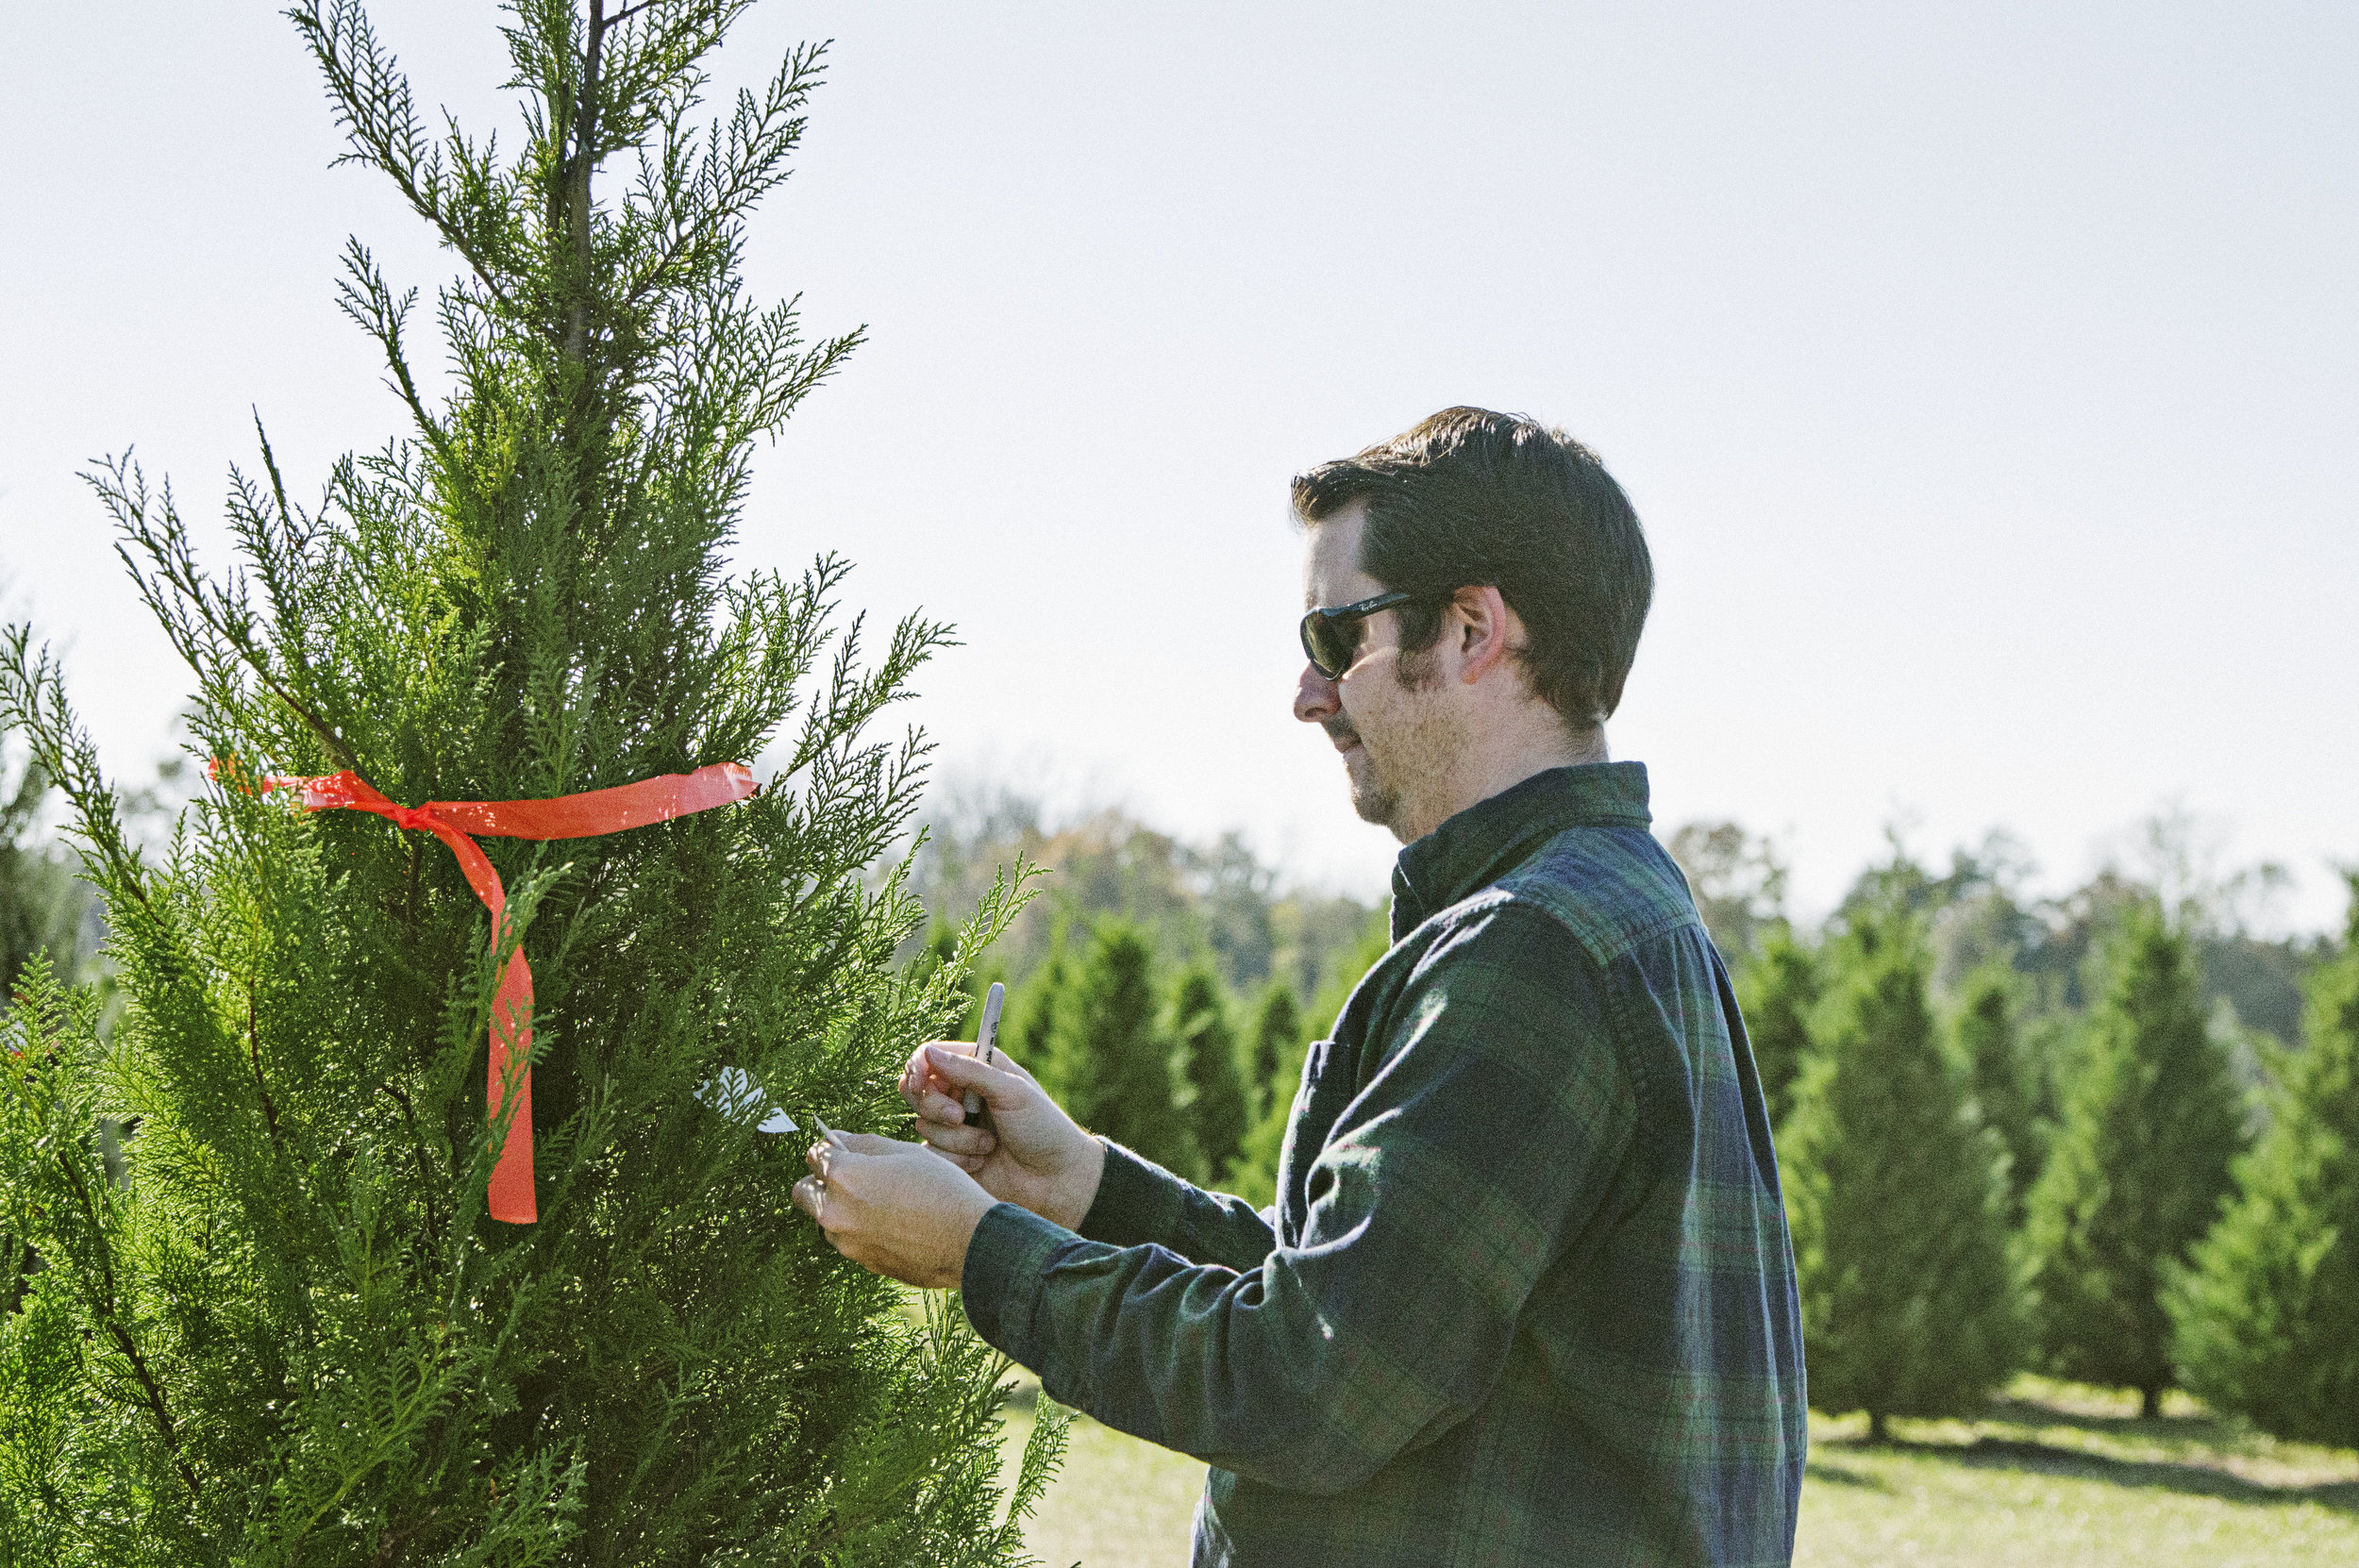 curry_farms_2015_tree_picking.jpg